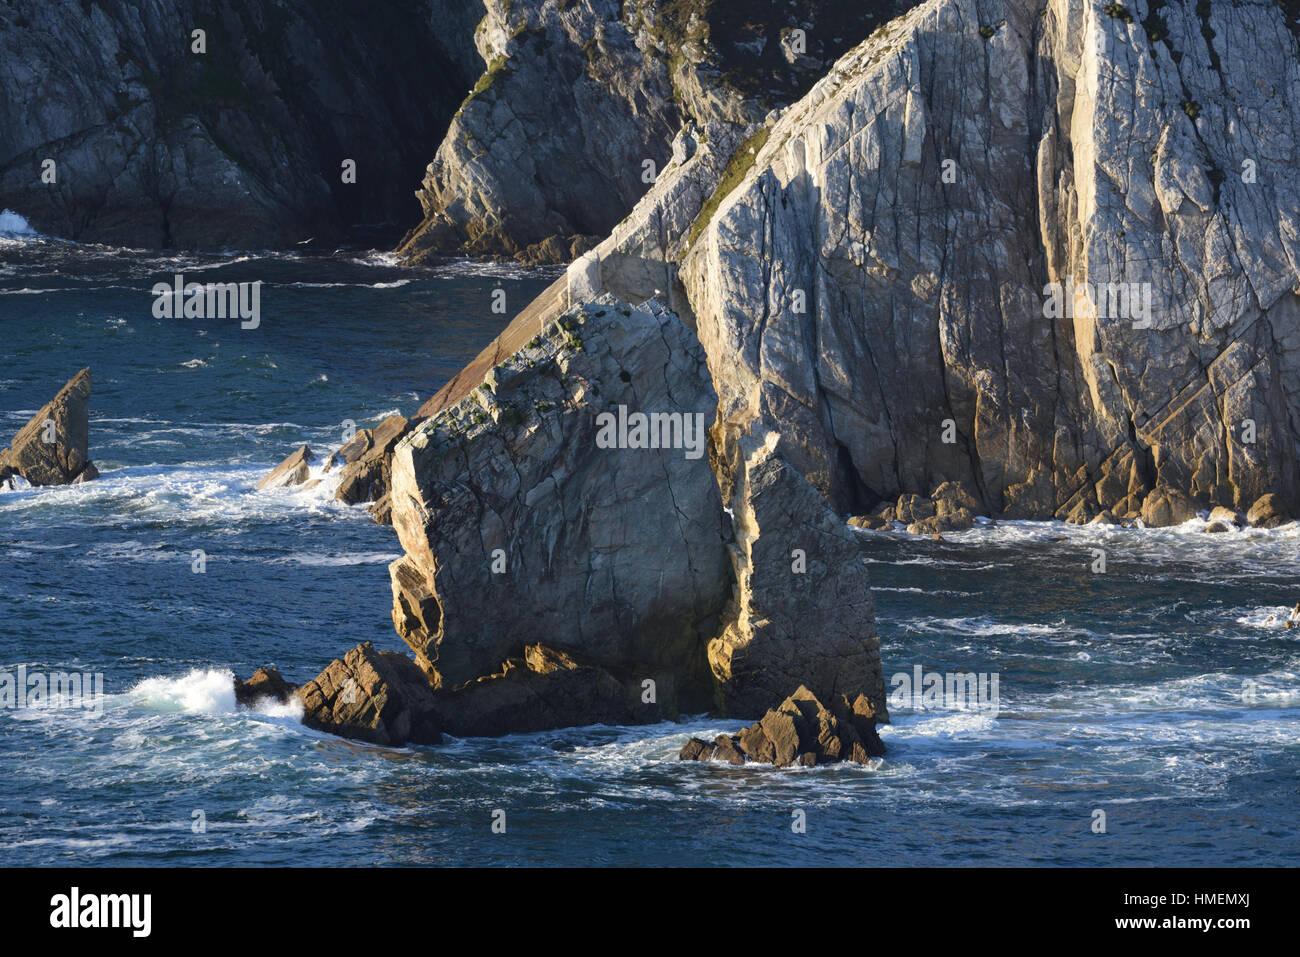 Cliffs off the Achill Island - Ireland - Stock Image